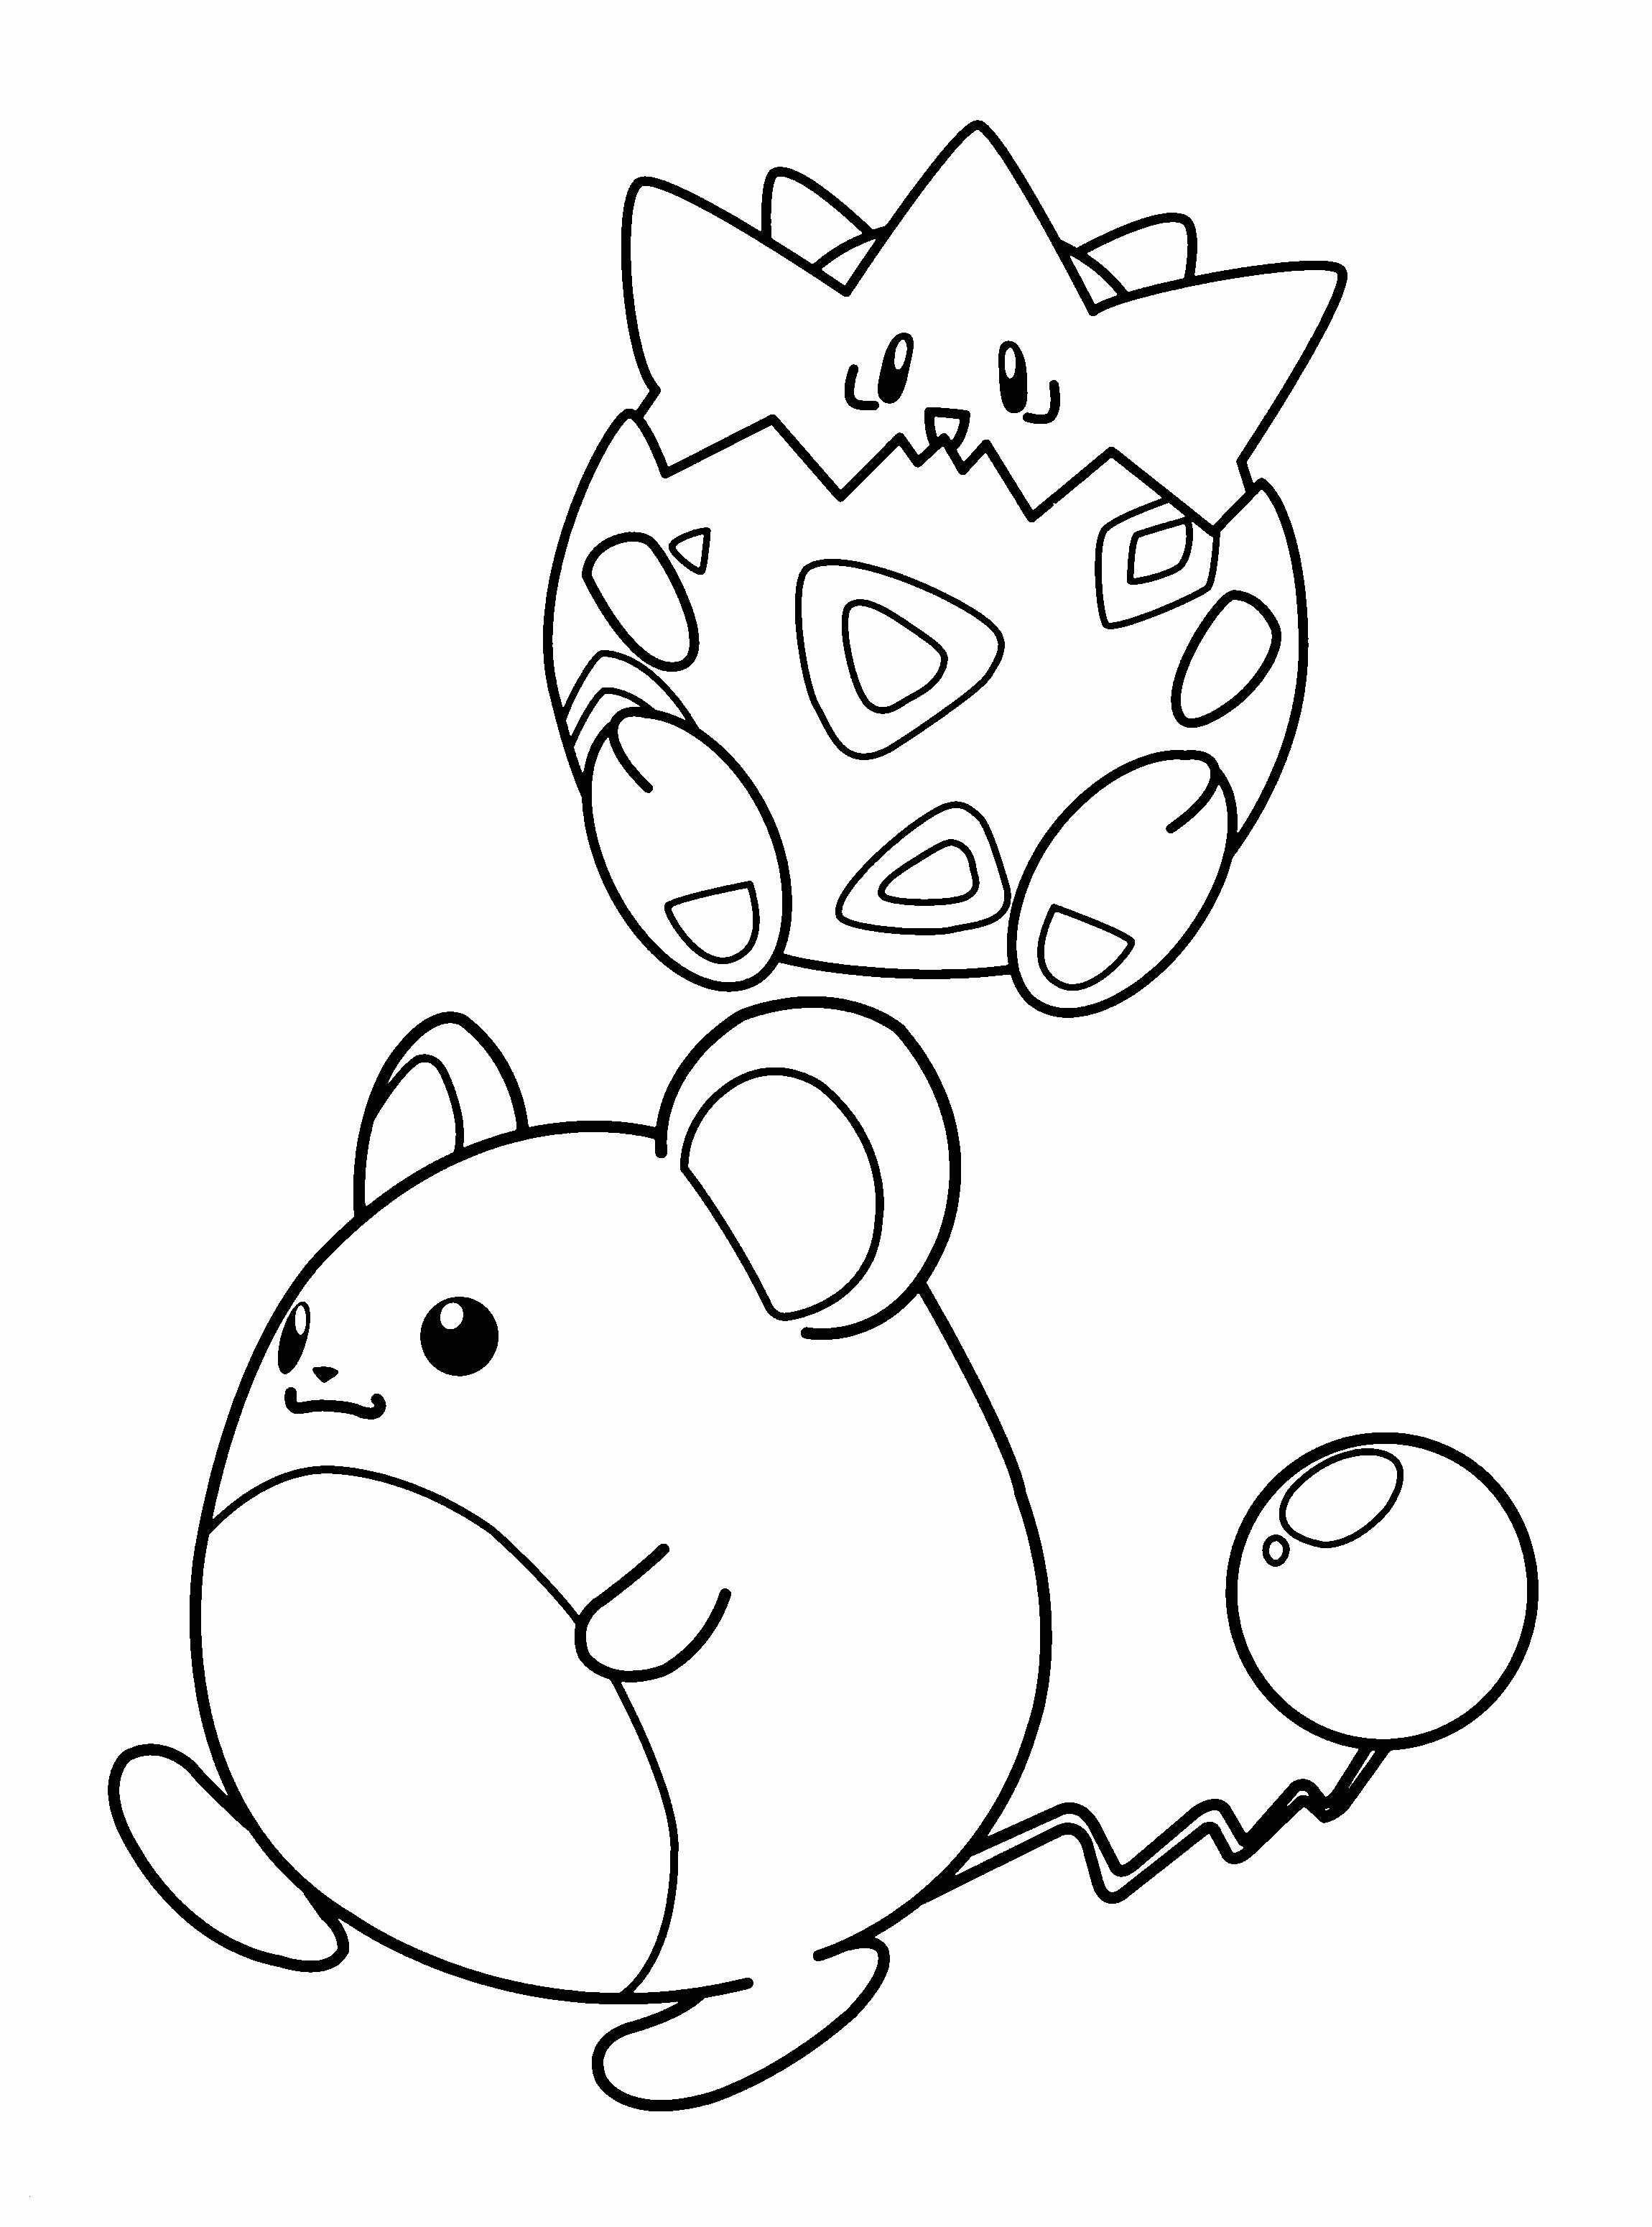 Ausmalbilder Cat Noir Neu Pokemon Ausmalbilder Neu Pokemon Ausmalbilder Aquana Bestimmt Für Sammlung